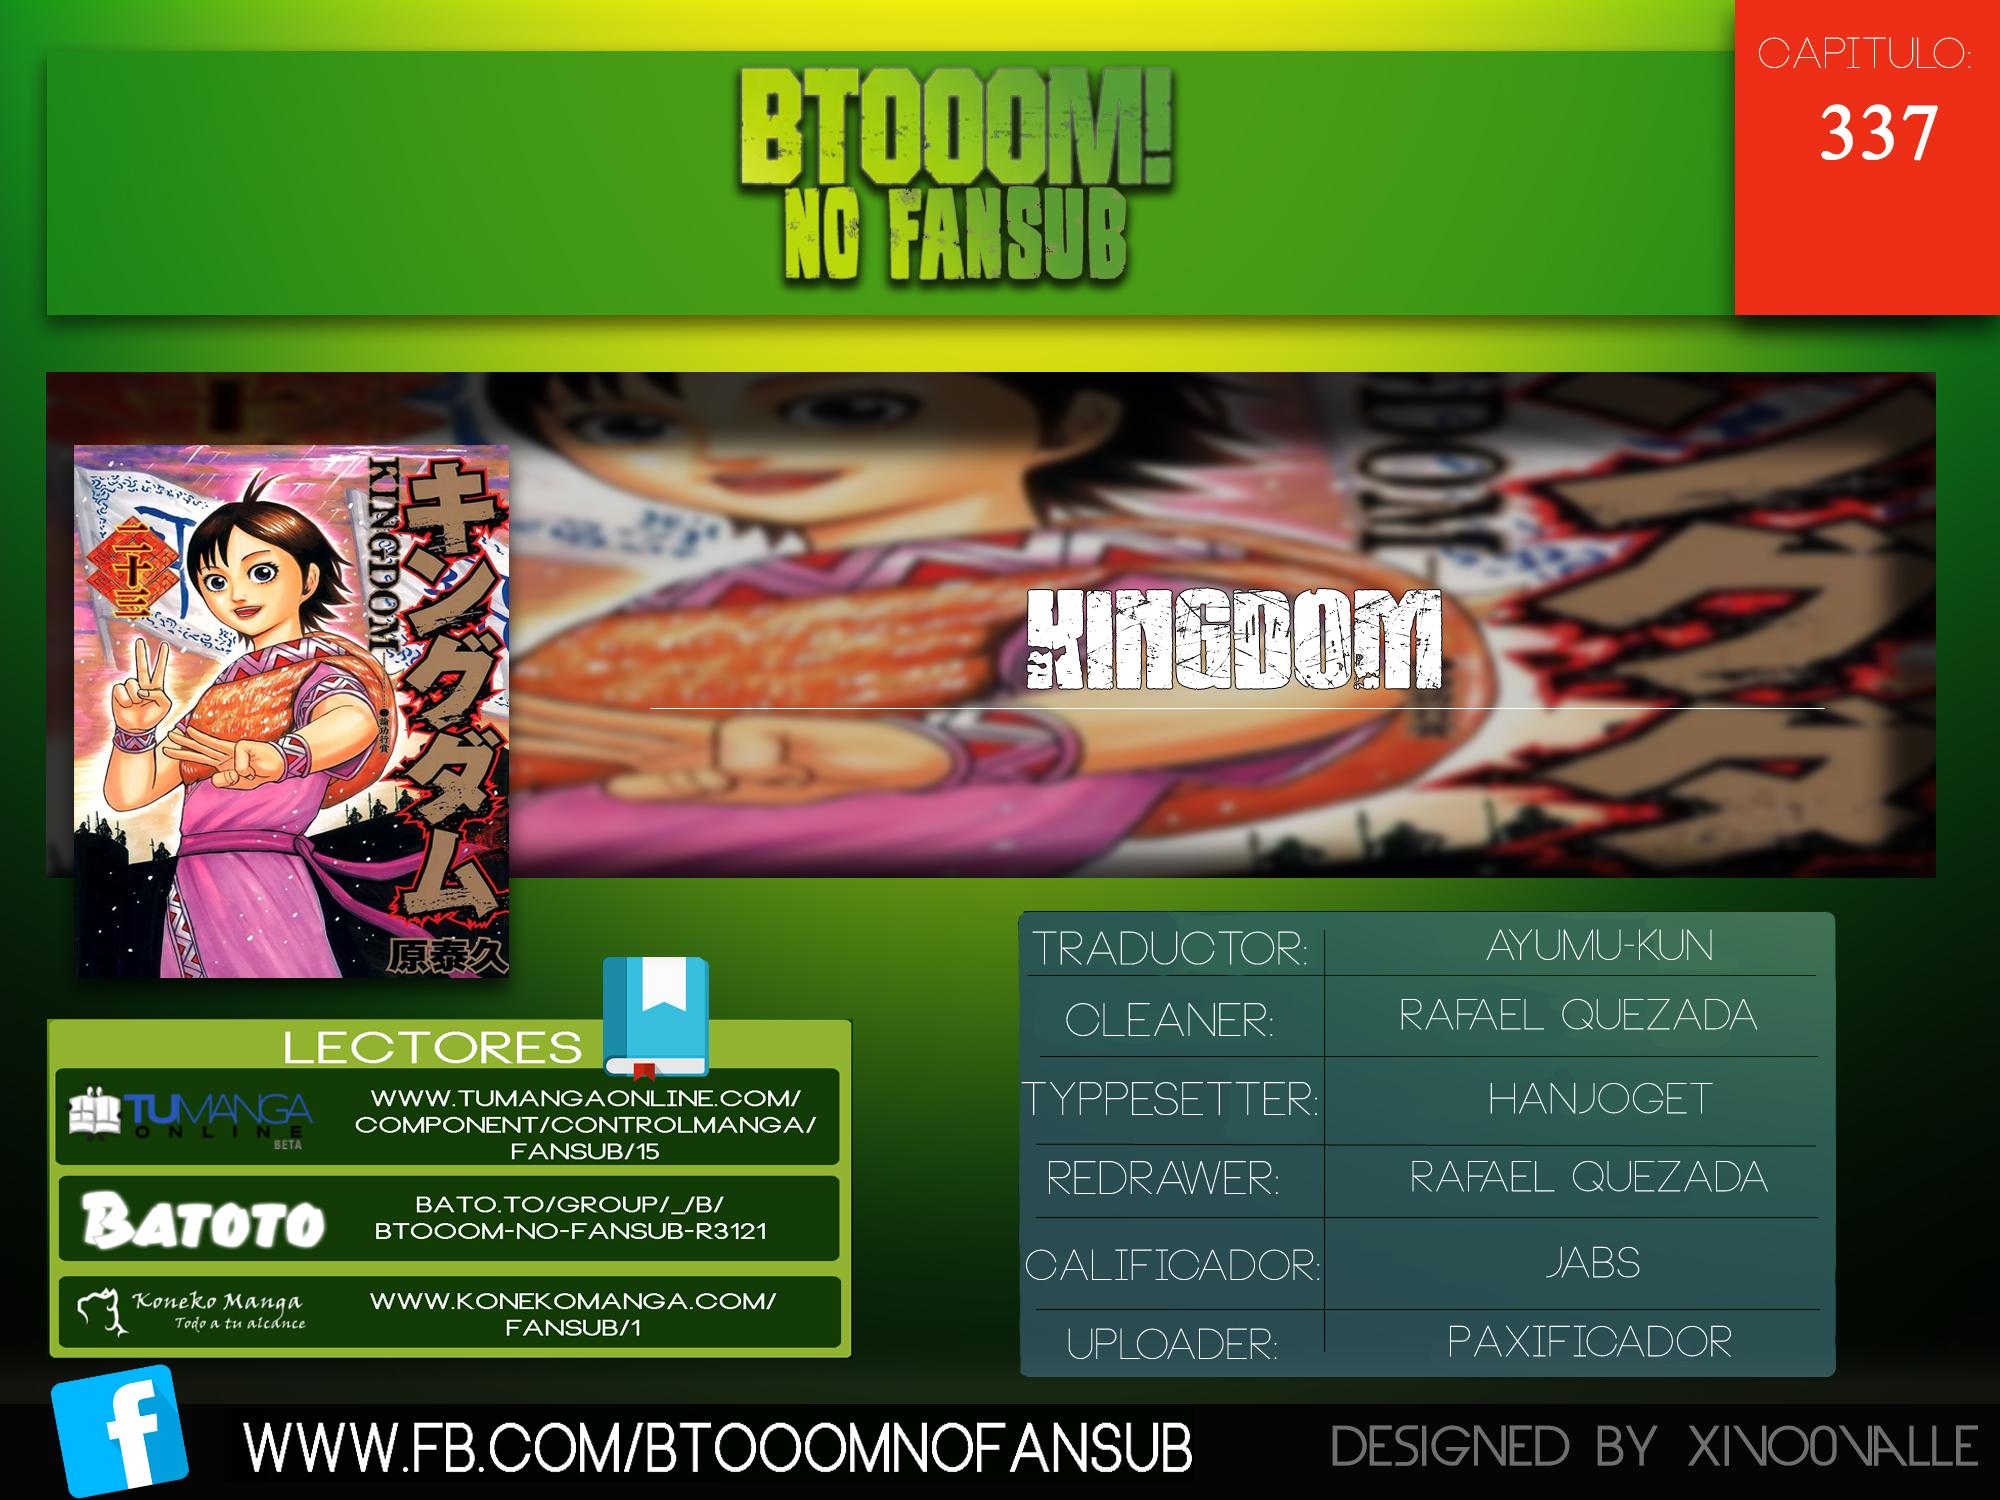 http://c5.ninemanga.com/es_manga/19/12307/360920/c529a75eee4961bfc46a79304cd9569c.jpg Page 1